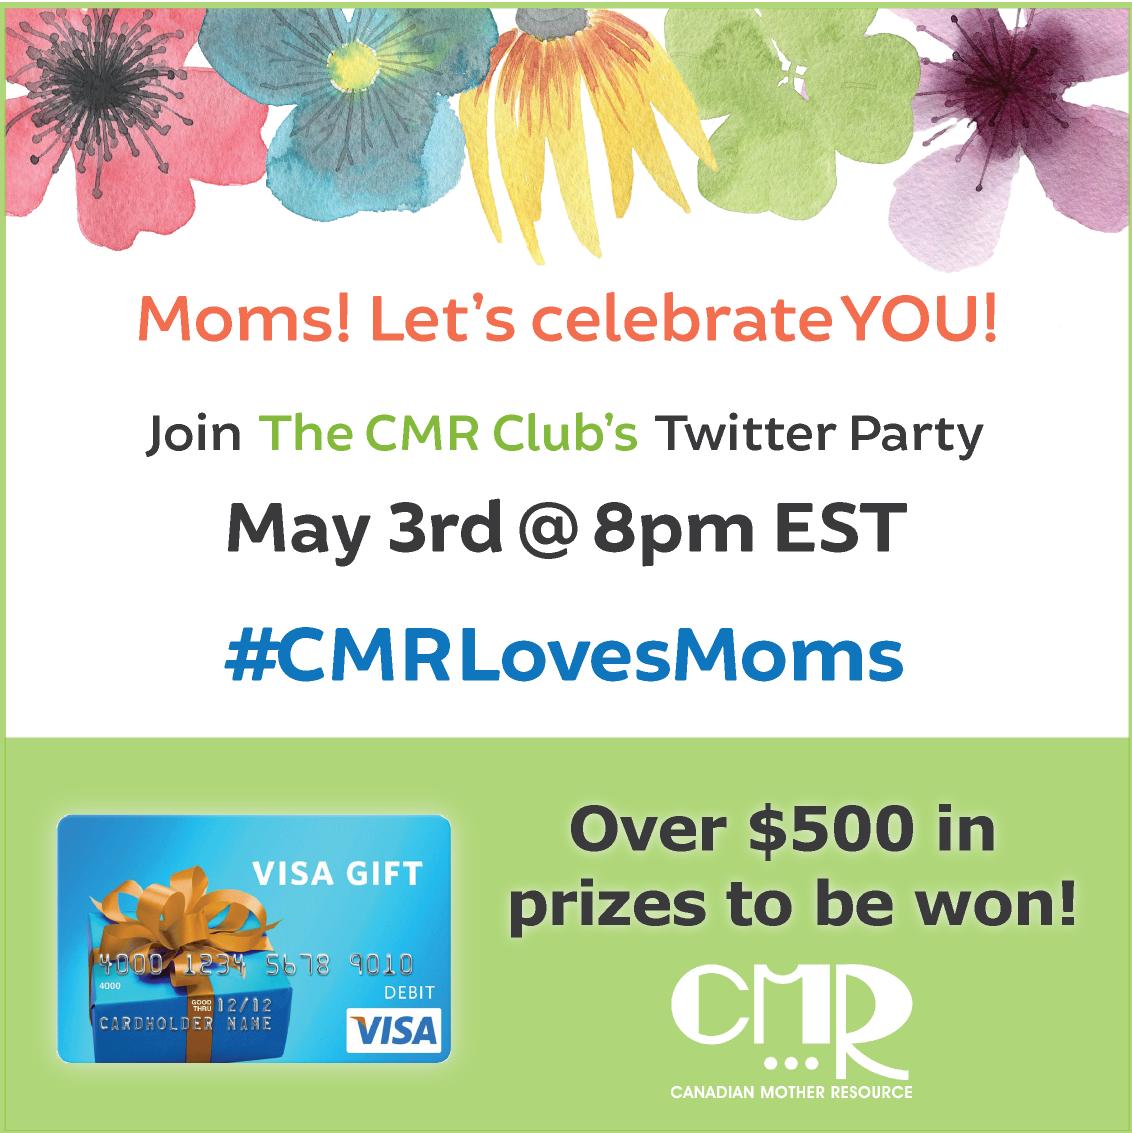 #CMRLovesMoms Twitter Party promo images copy